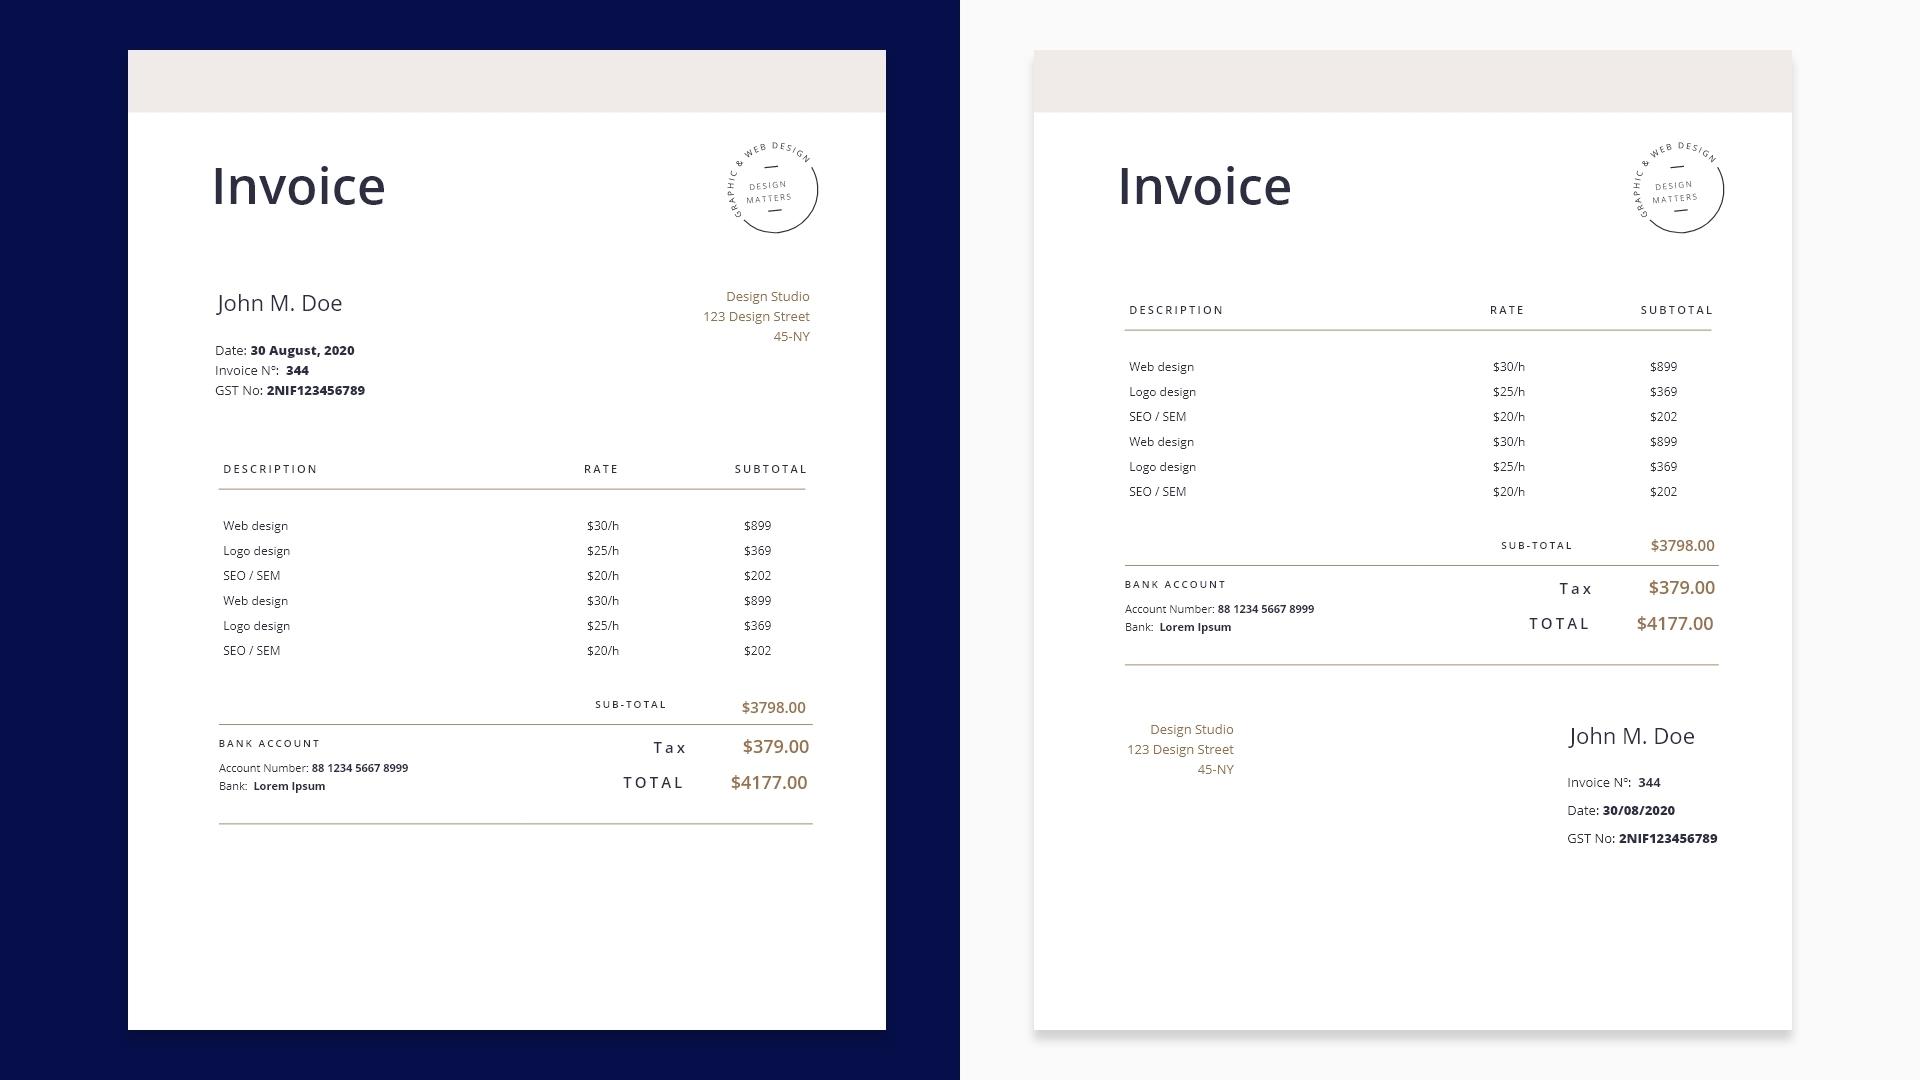 Sample invoice layout